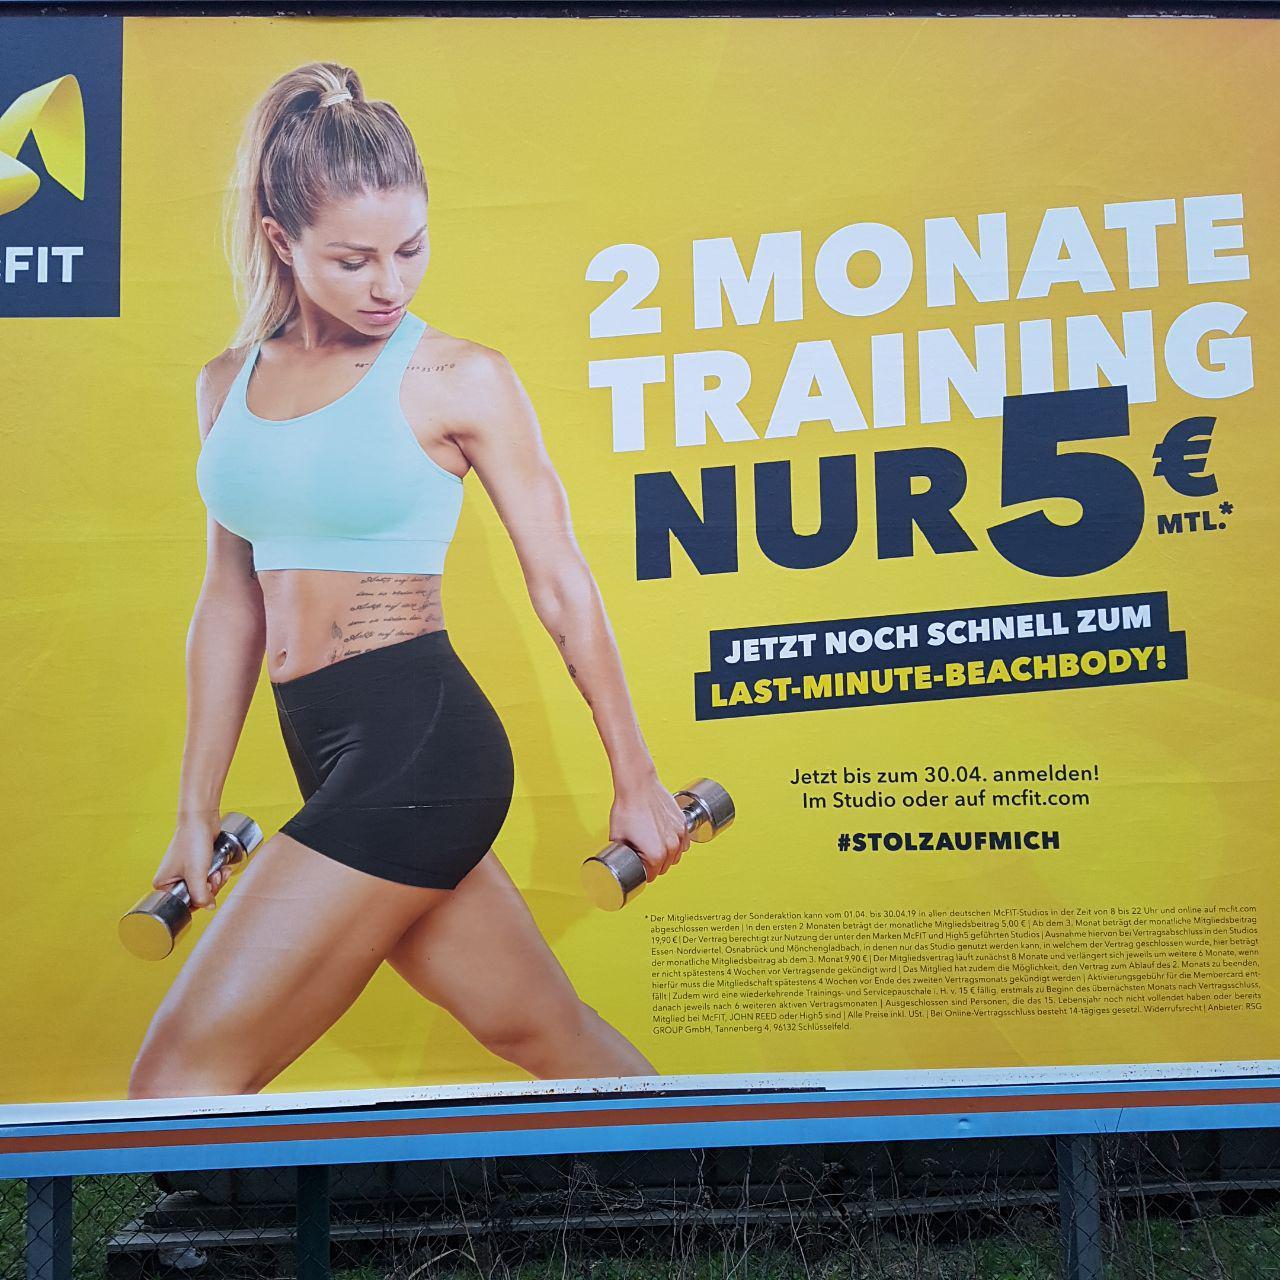 McFit Frühlingsaktion 10 € = 2 Monate Training (2x 5€) Kein Aprilscherz!